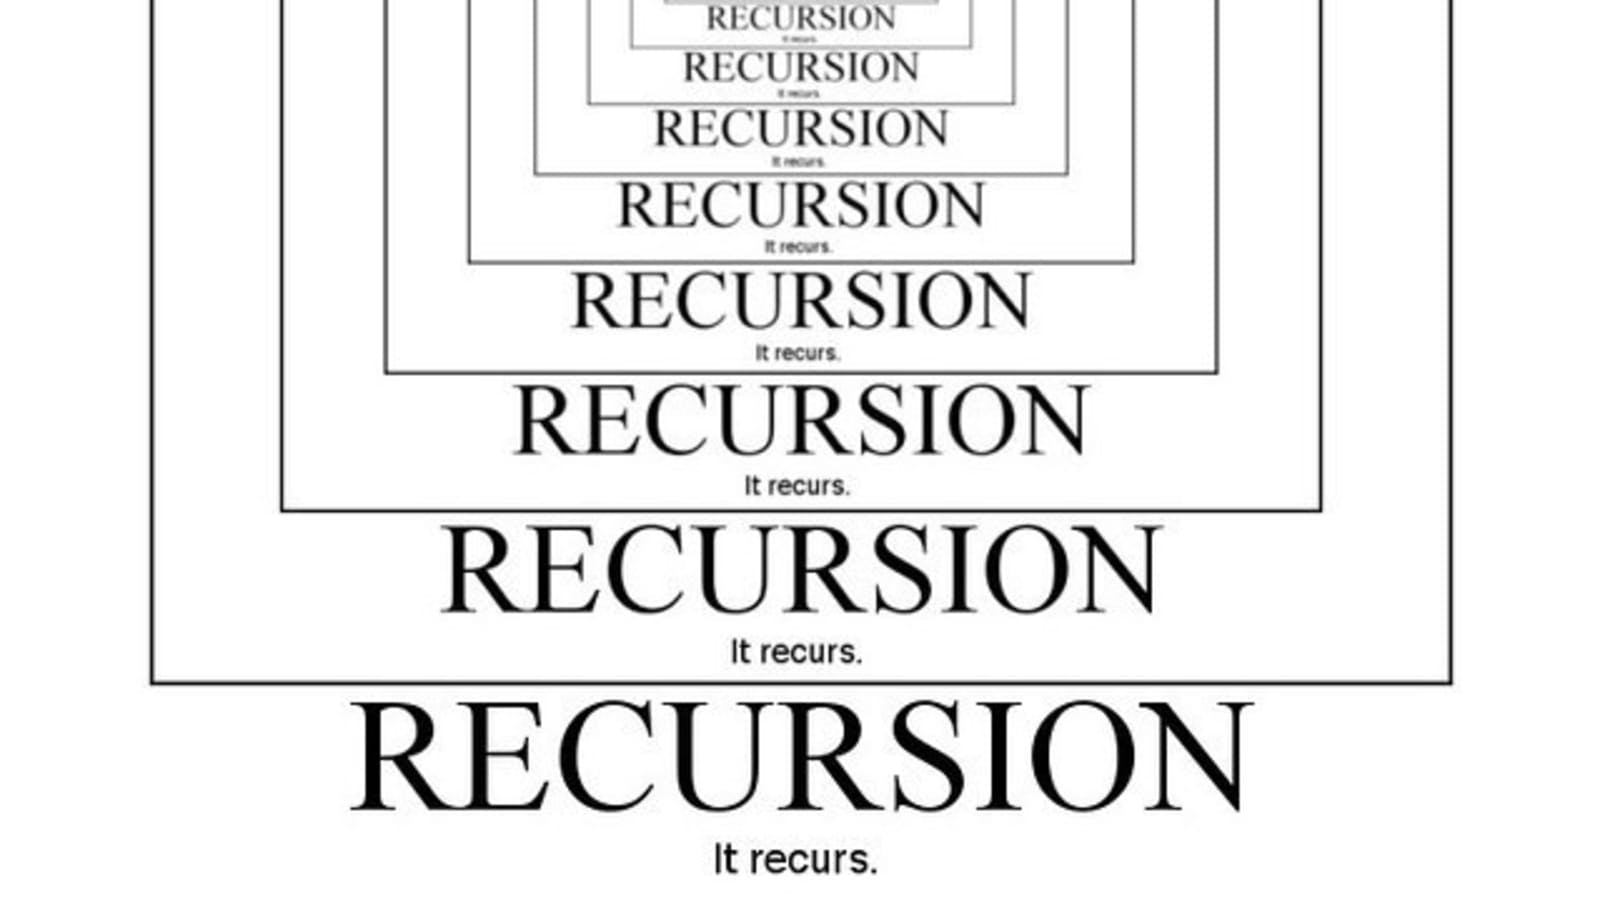 Recursive function